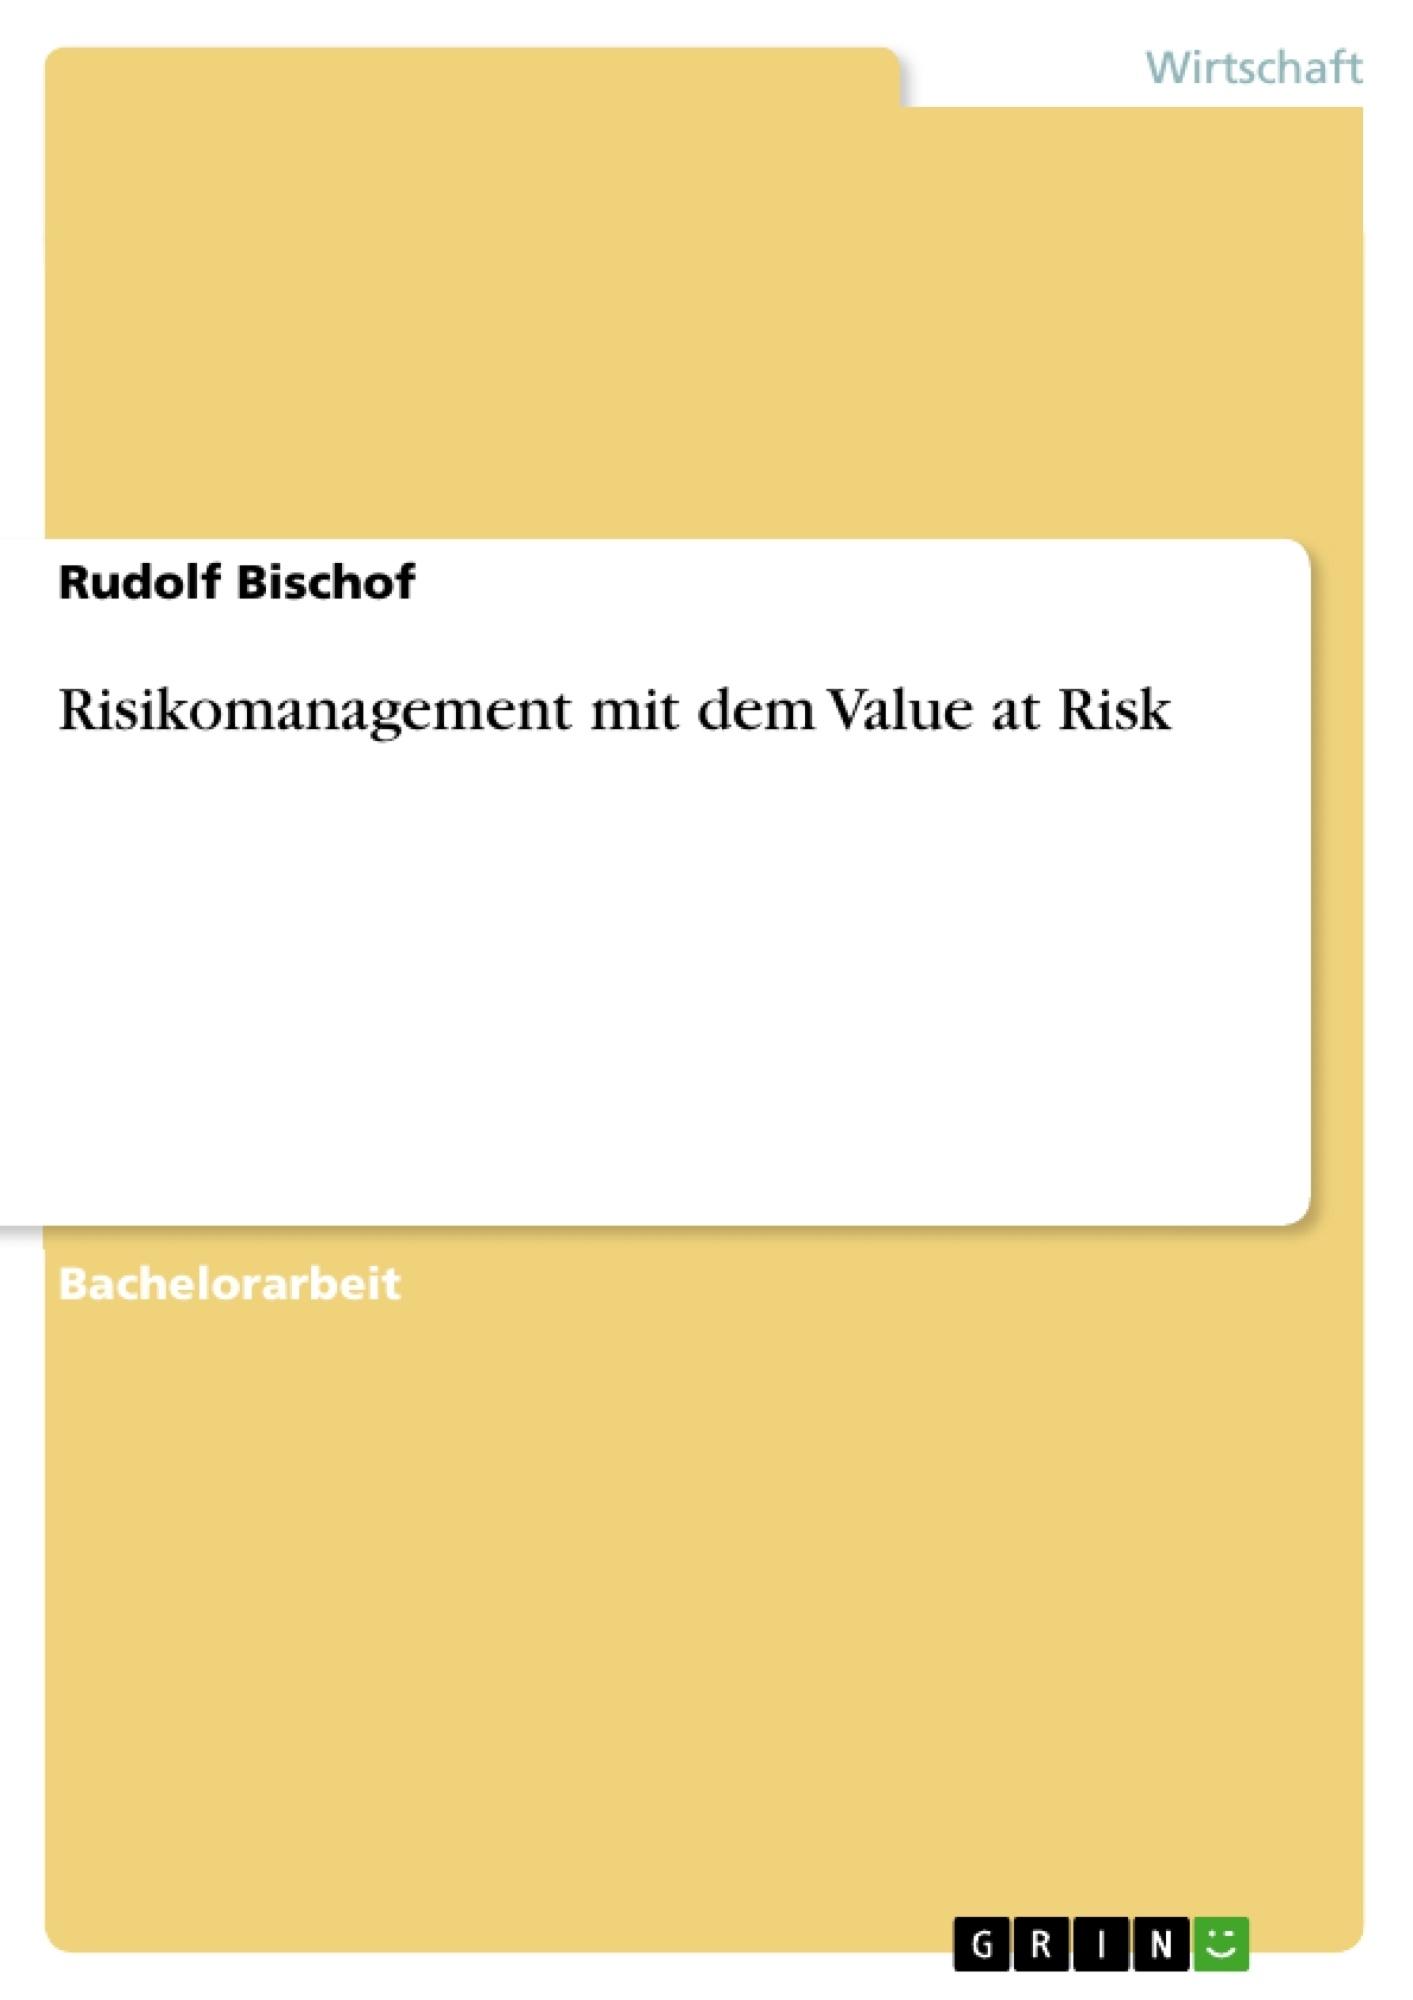 Titel: Risikomanagement mit dem Value at Risk